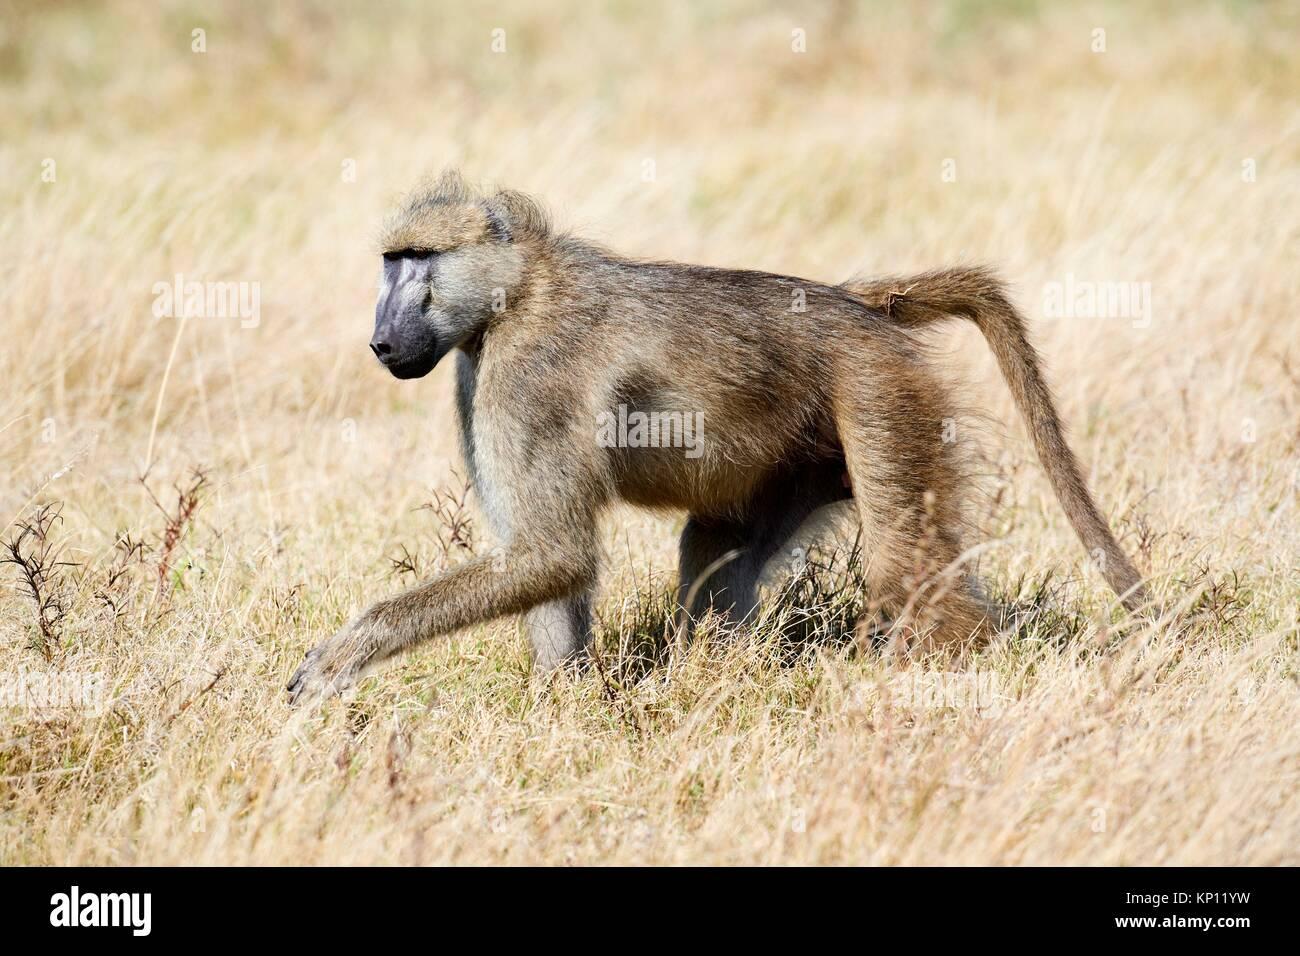 Chacma baboon (Papio ursinus), Duba Plains concession, Okavango delta, Botswana, Southern Africa. - Stock Image